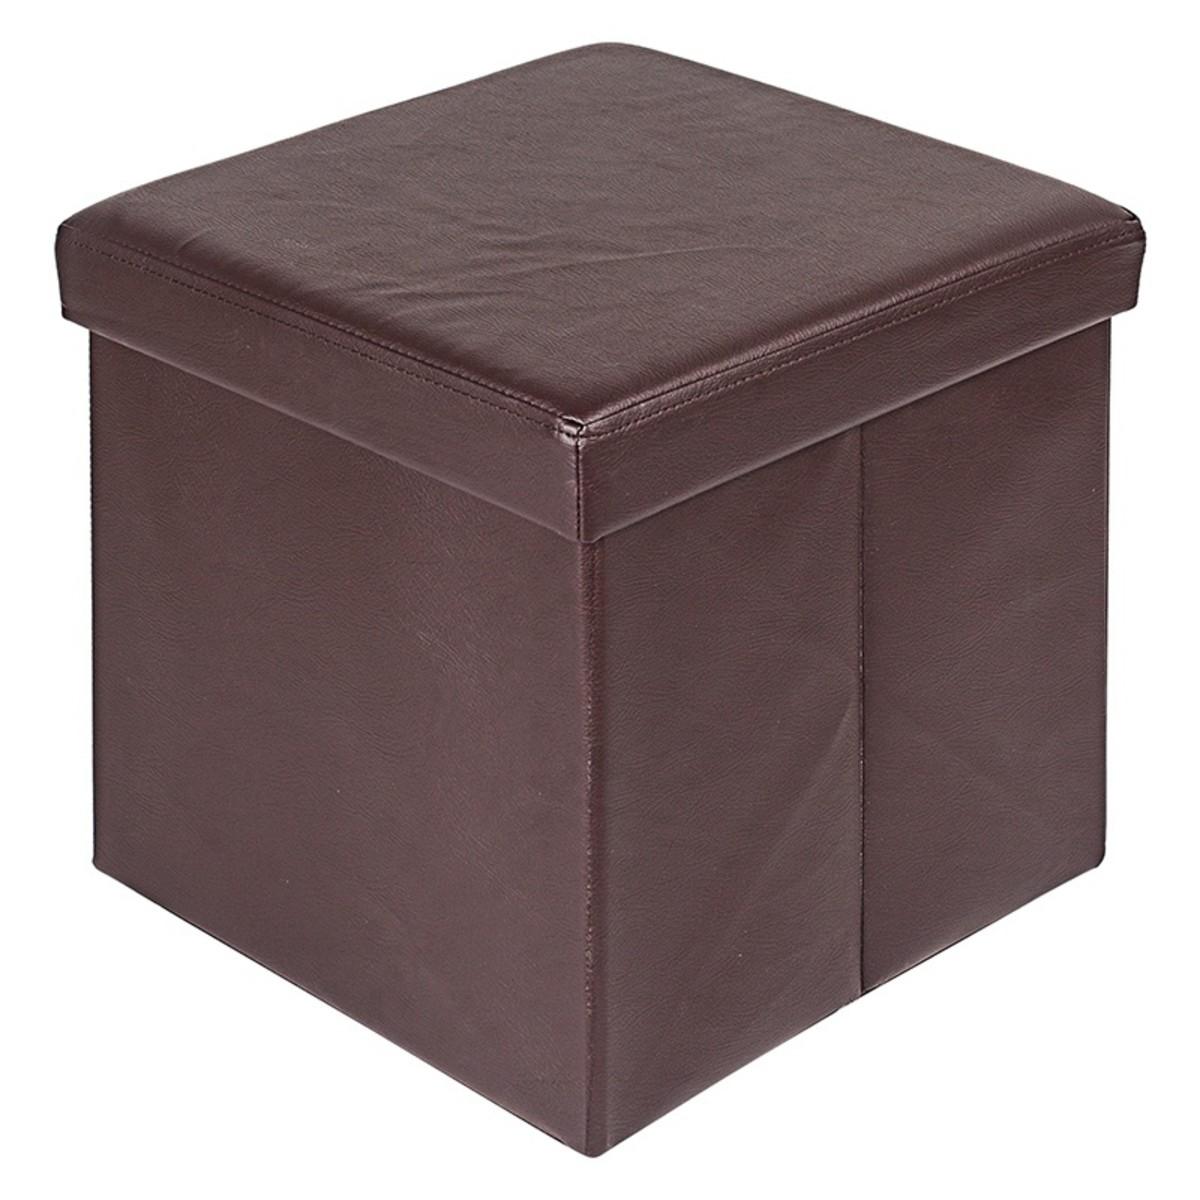 Короб Hausmann для хранения 38x38x38 см цвет коричневый